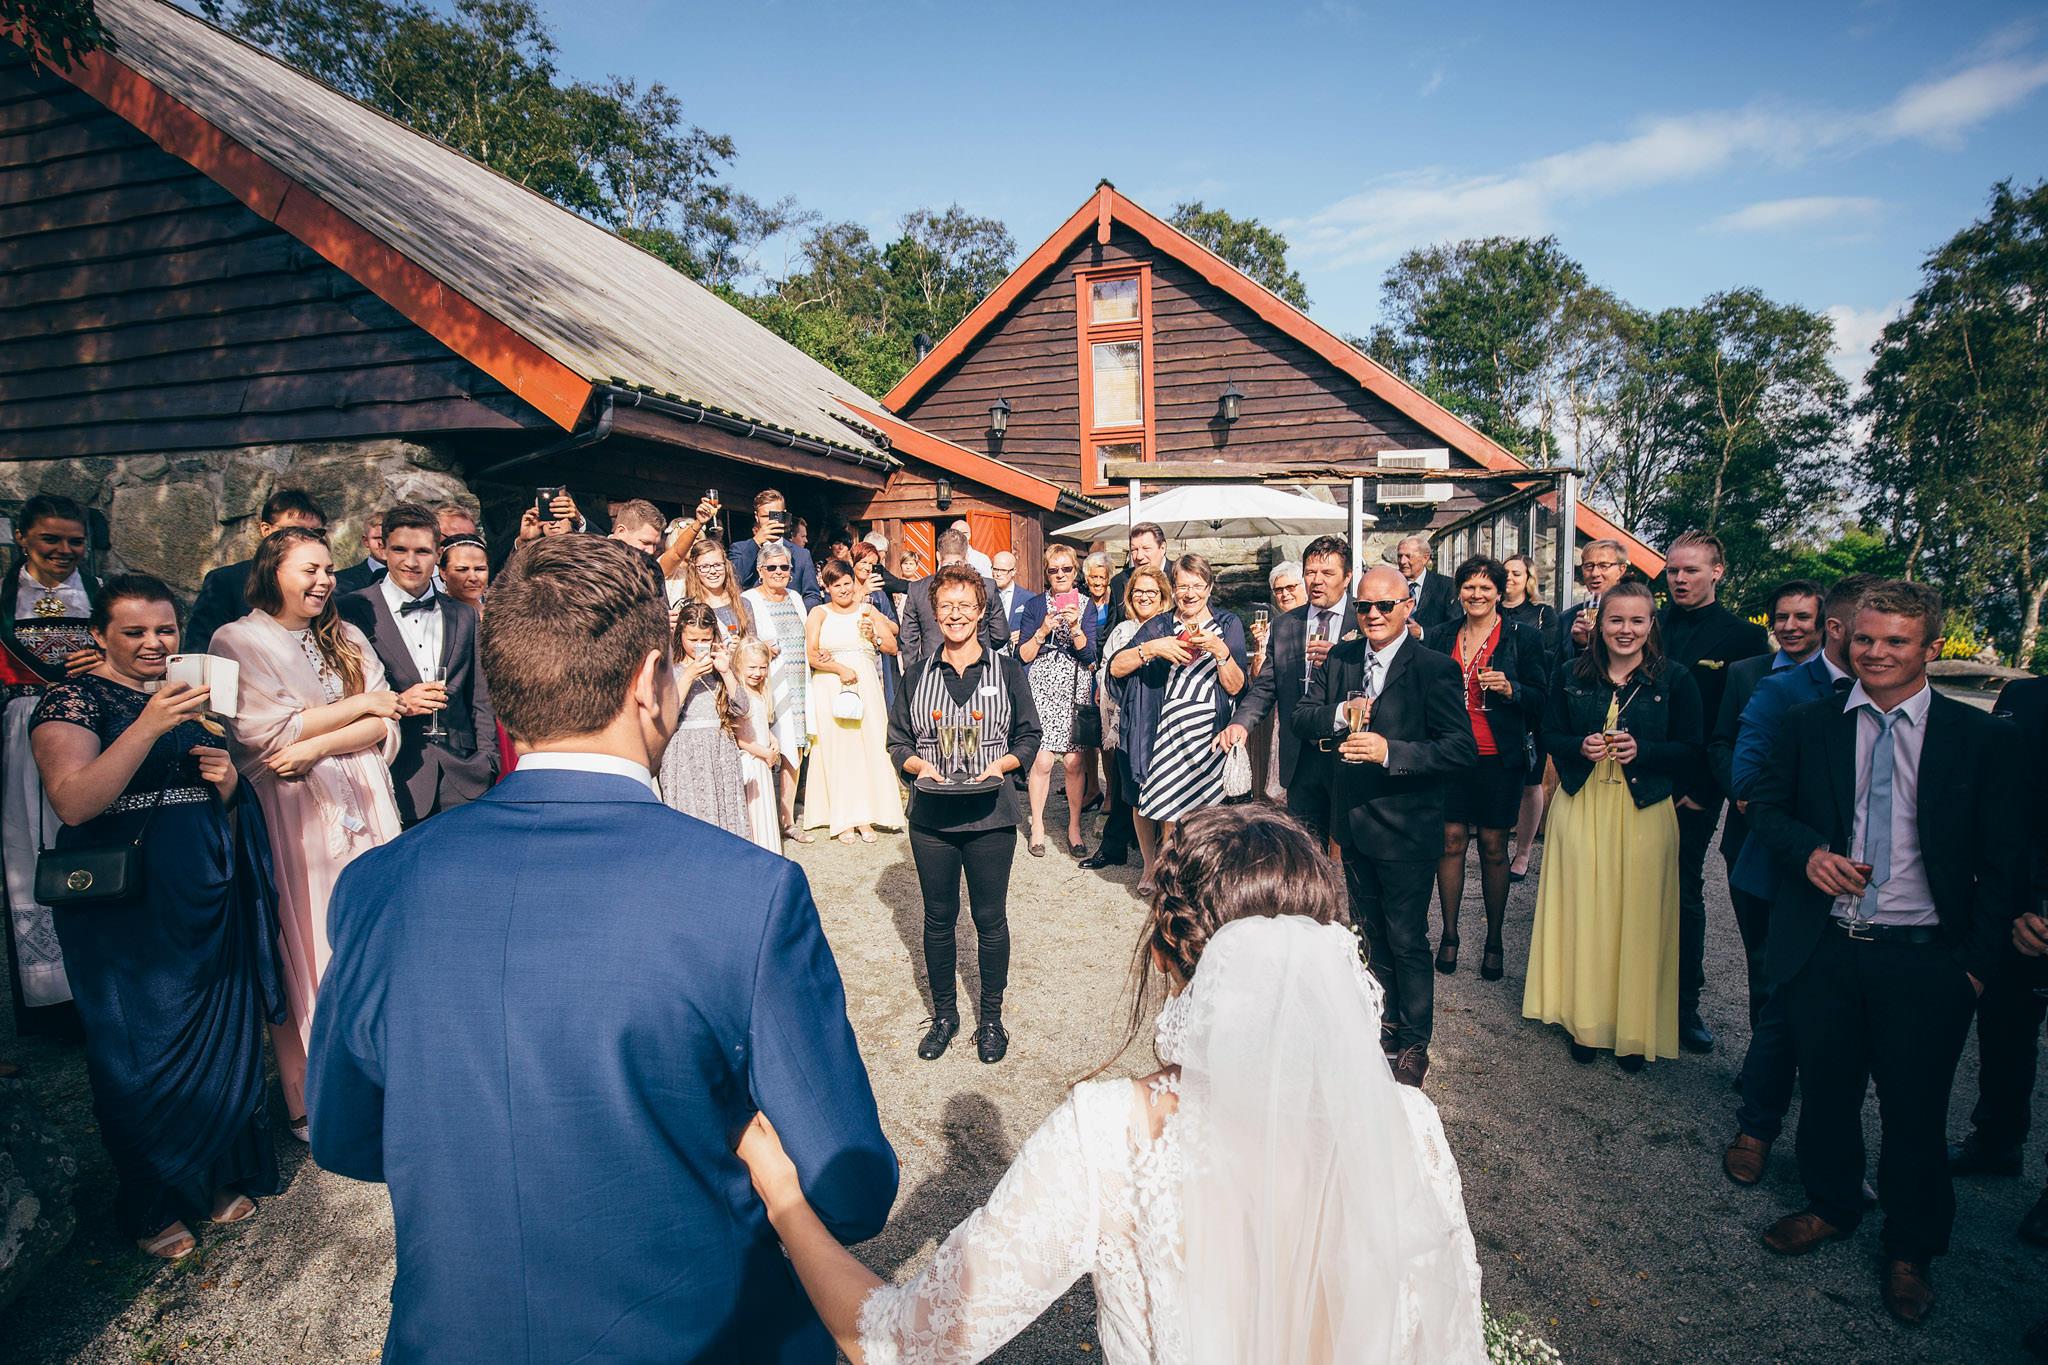 Norway+wedding+photographer+elopement+pre+wedding+Casey+Arneson-97.jpg